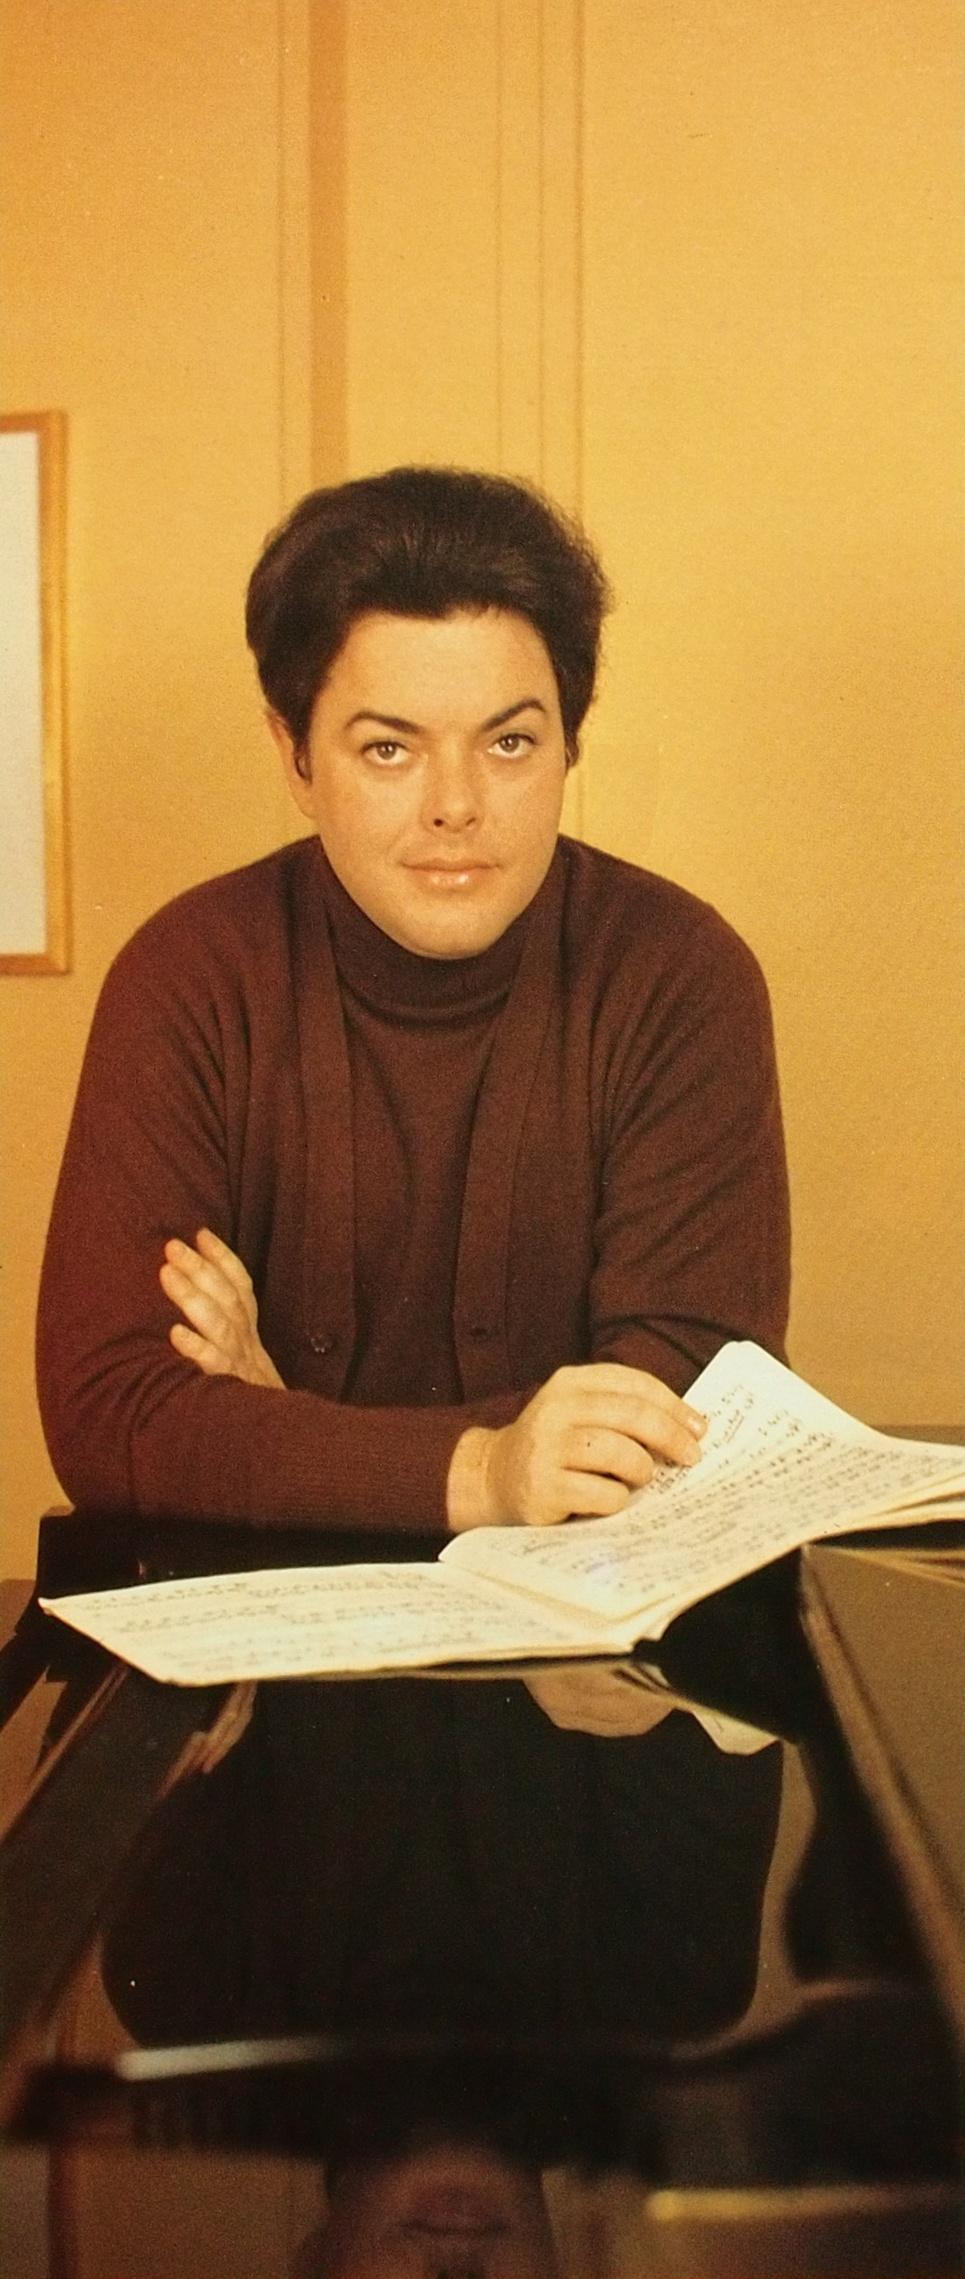 Bruno-Leonardo GELBER, photo de presse EMI, photographe, date et lieu inconnus